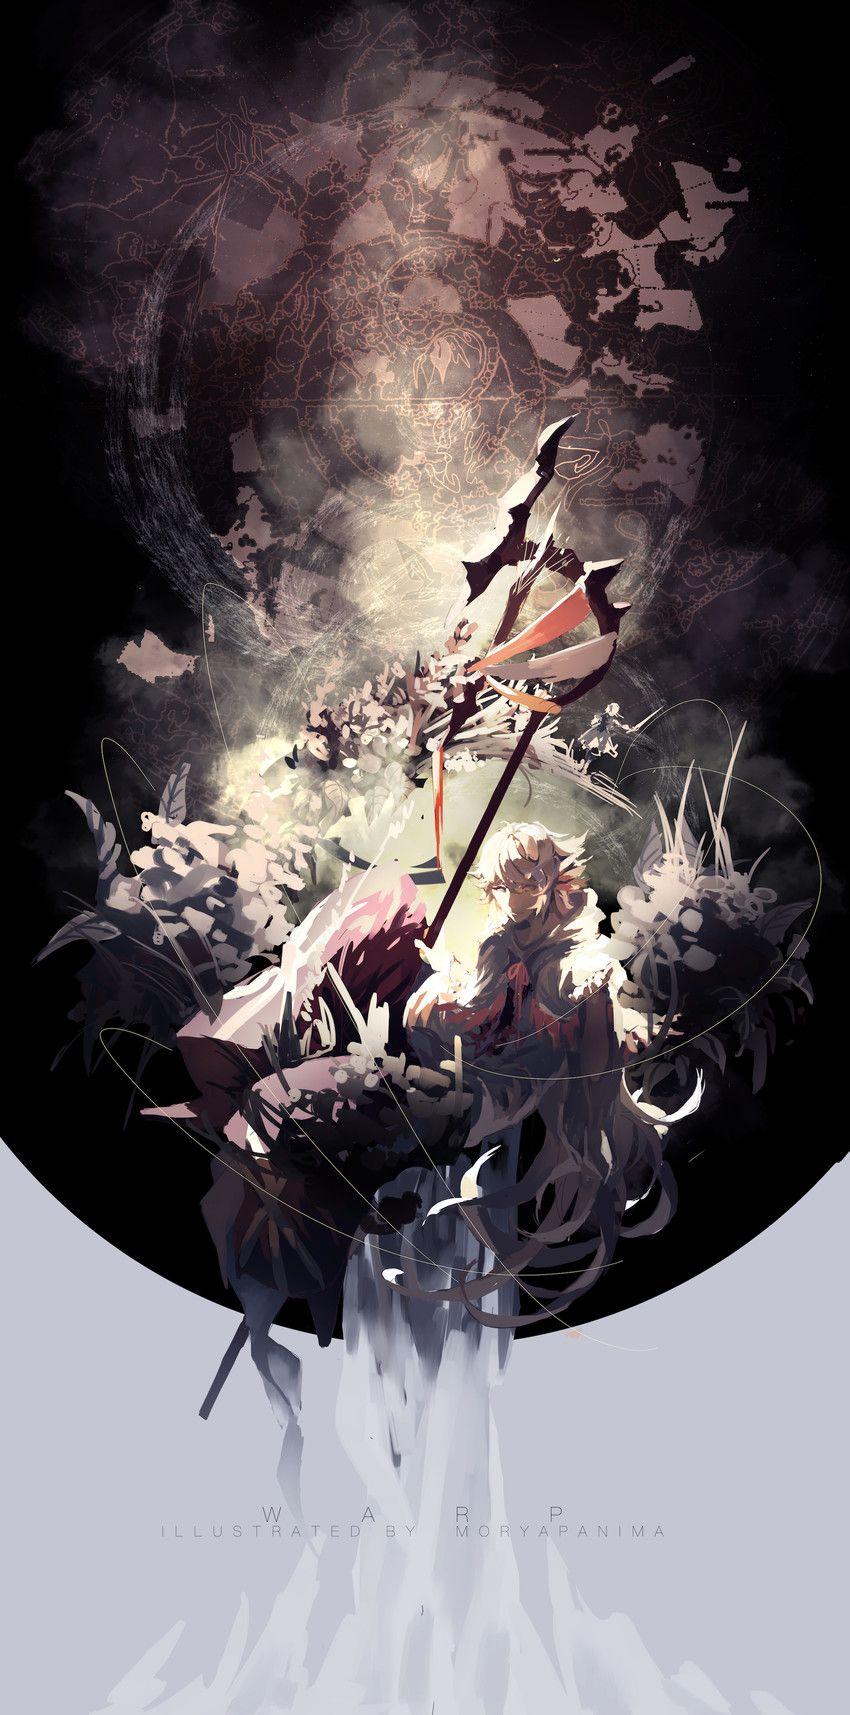 Merlin Fate Grand Order Merlin Fate Stay Night Anime